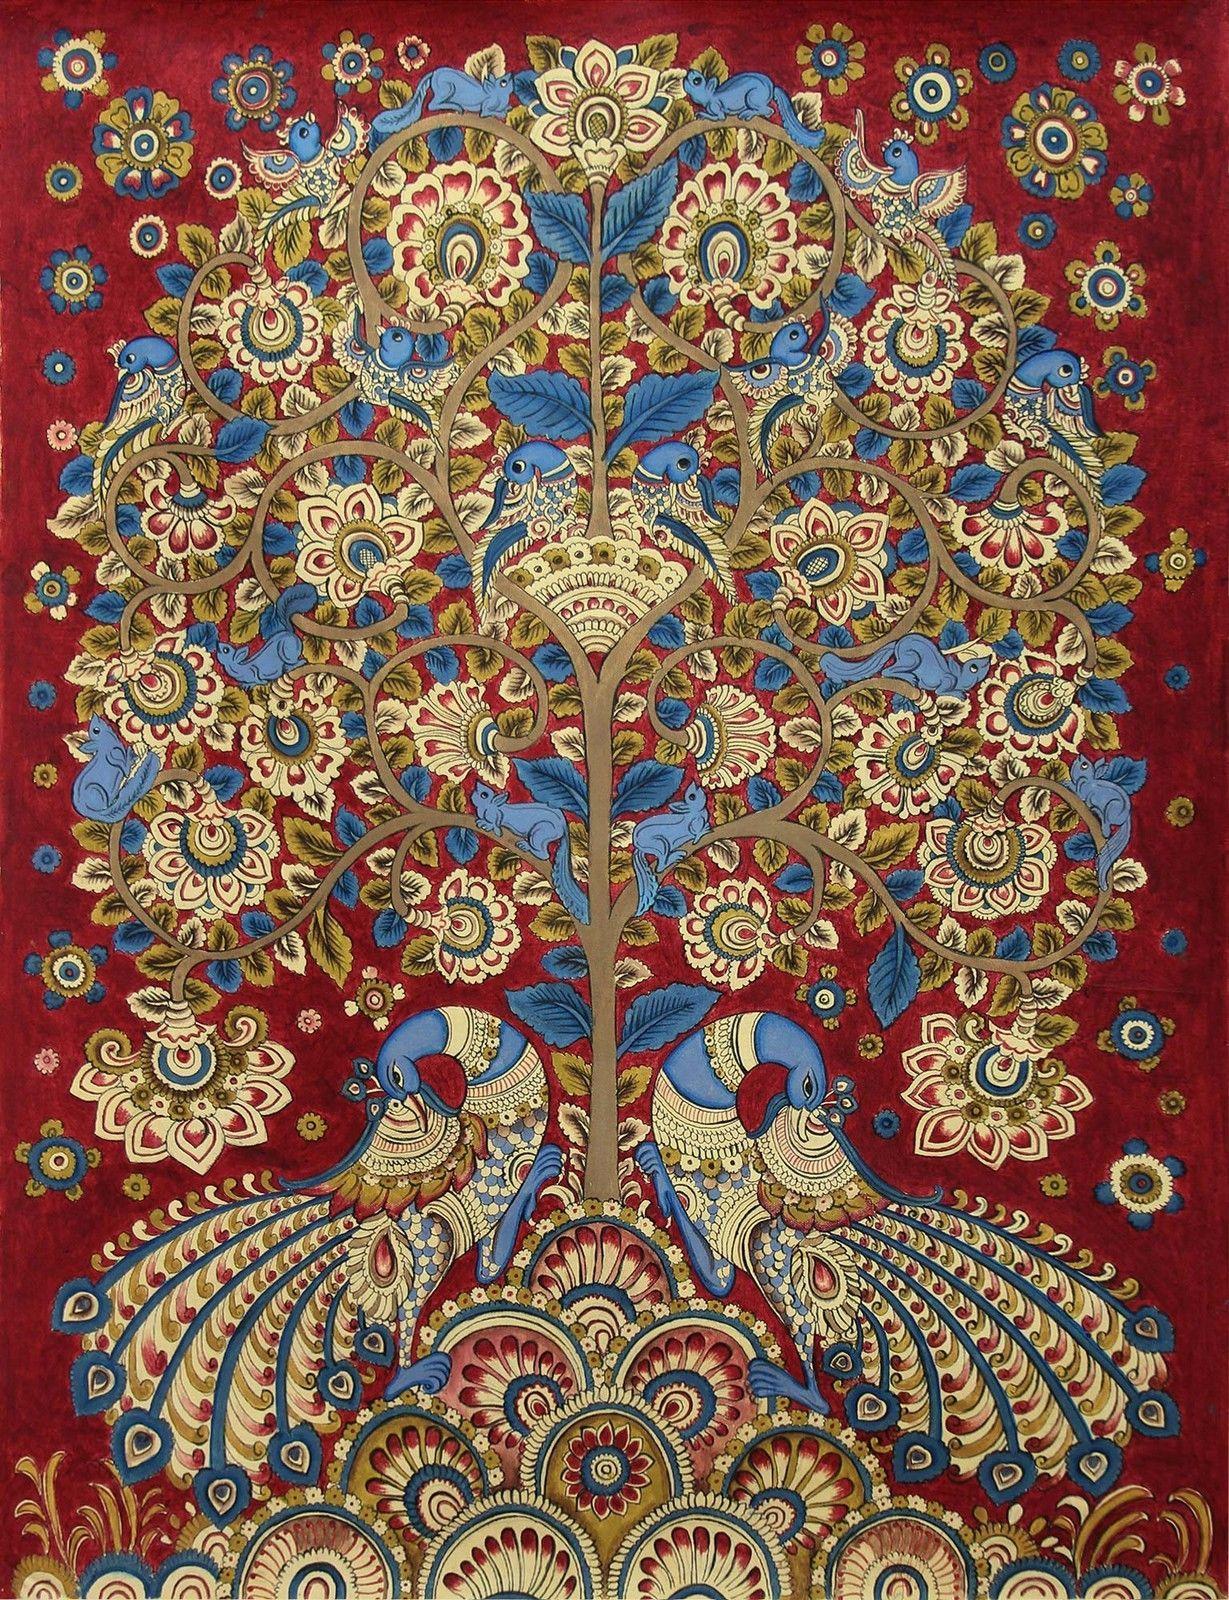 kalamkari painting tree of life signed folk art